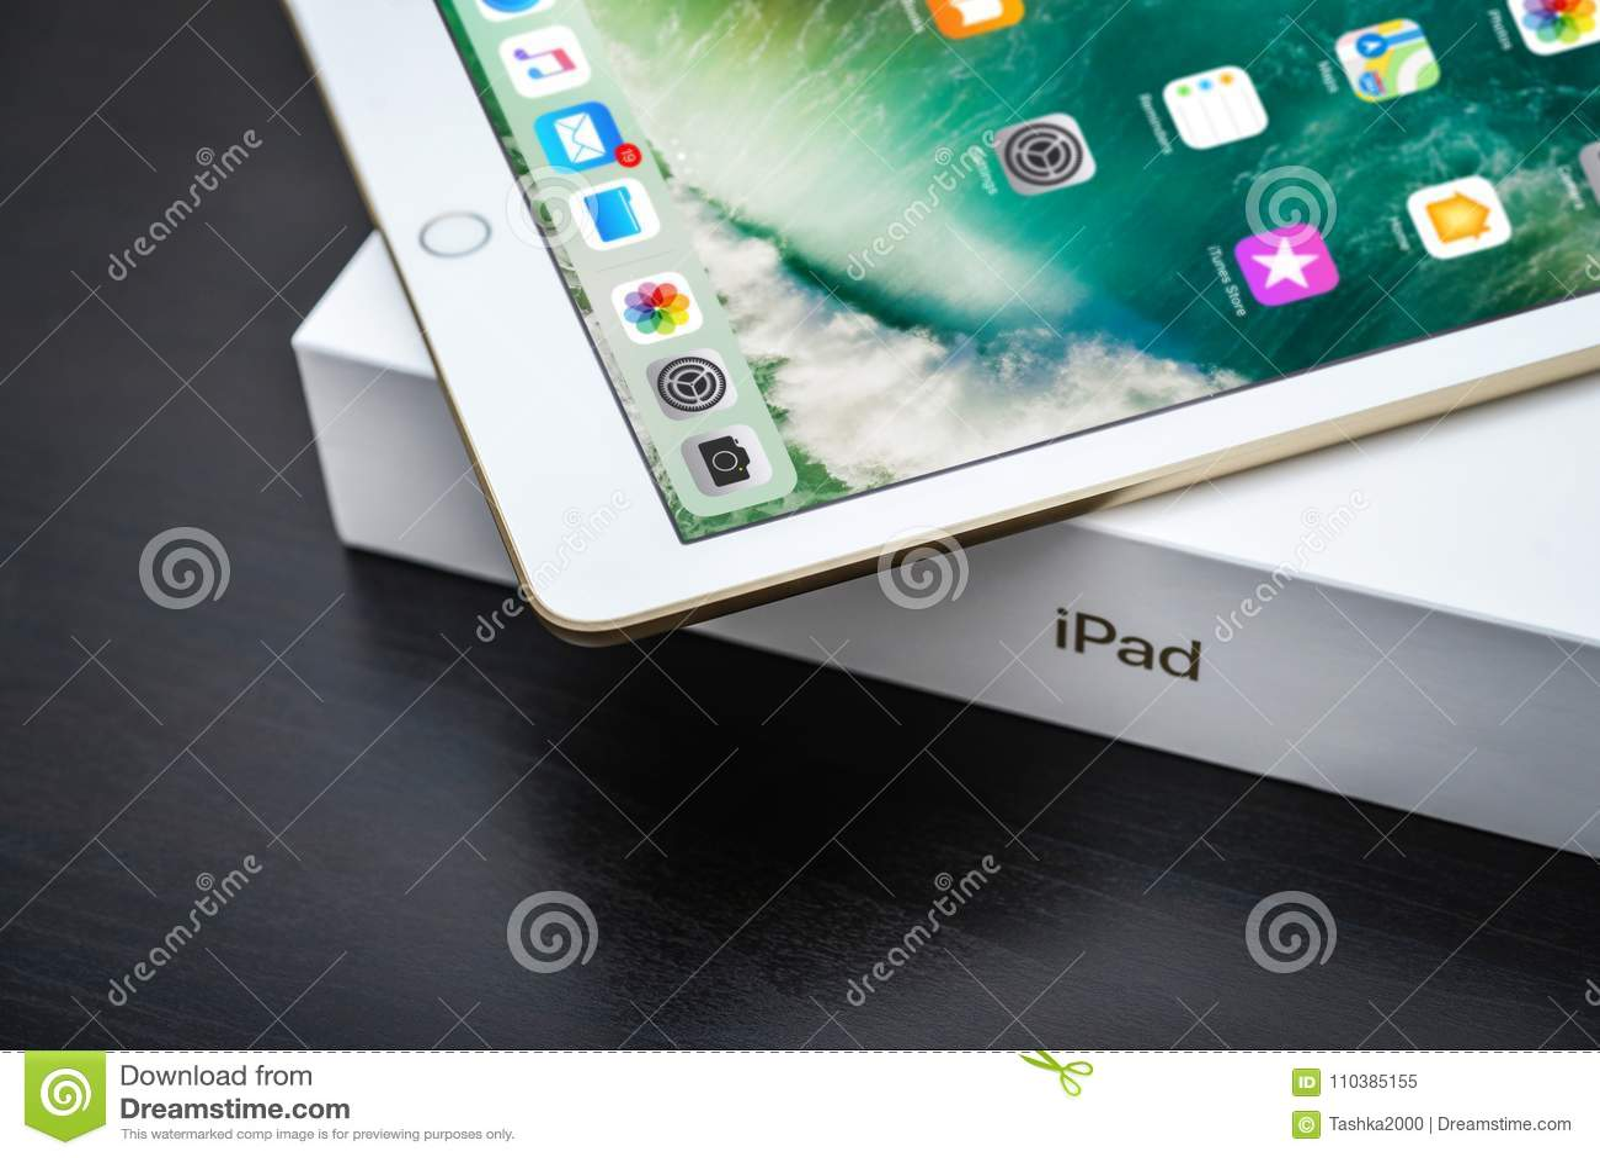 Brand new white Apple iPad Gold